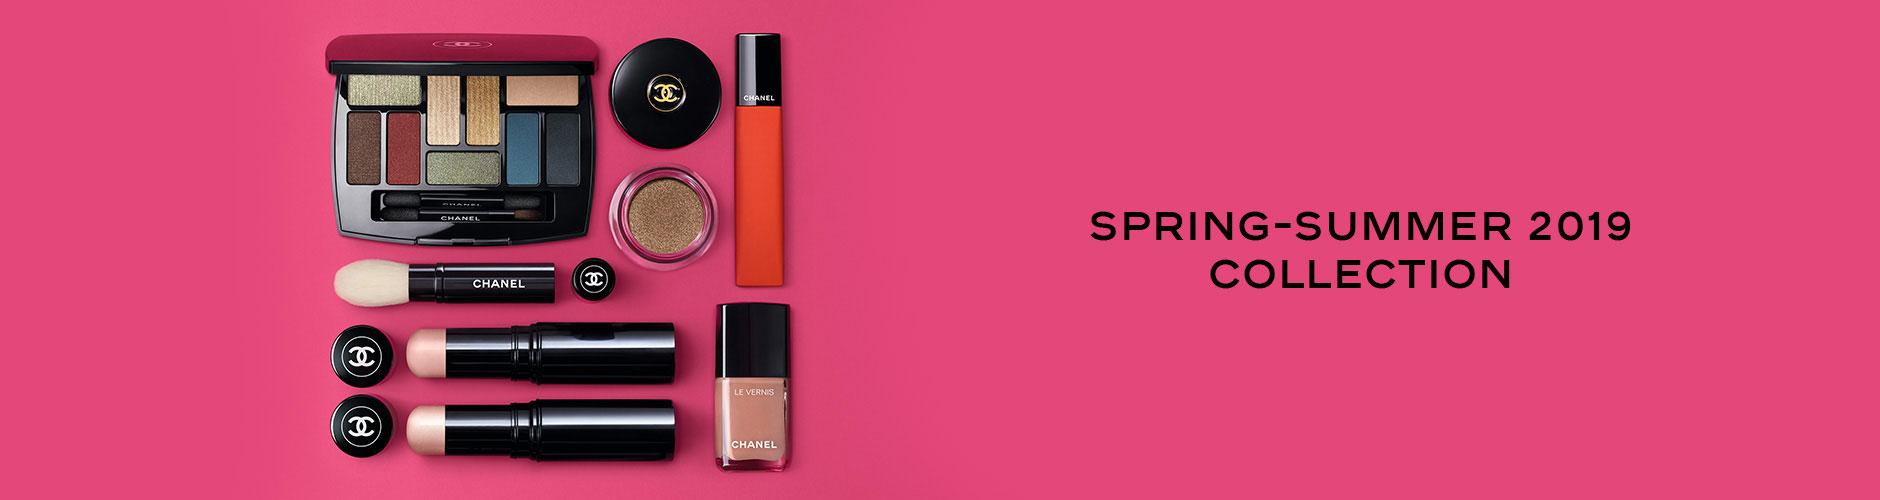 76b7231995 CHANEL Makeup : Foundation & Mascaras at Bergdorf Goodman